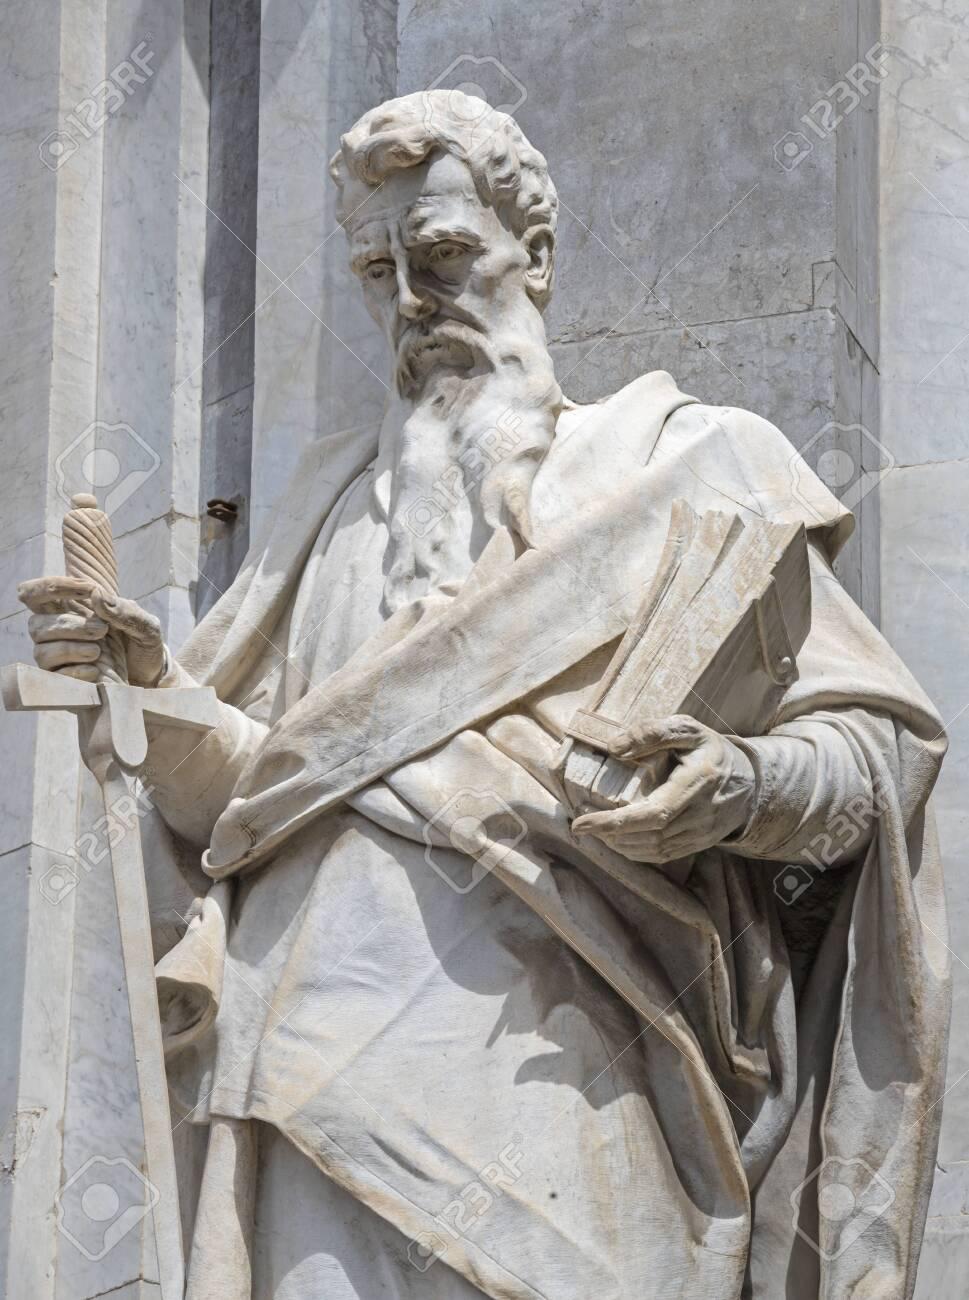 CATANIA, ITALY - APRIL 8, 2018: The statue of St. Paul the Apostle in front of Basilica di Sant'Agata. - 150187706